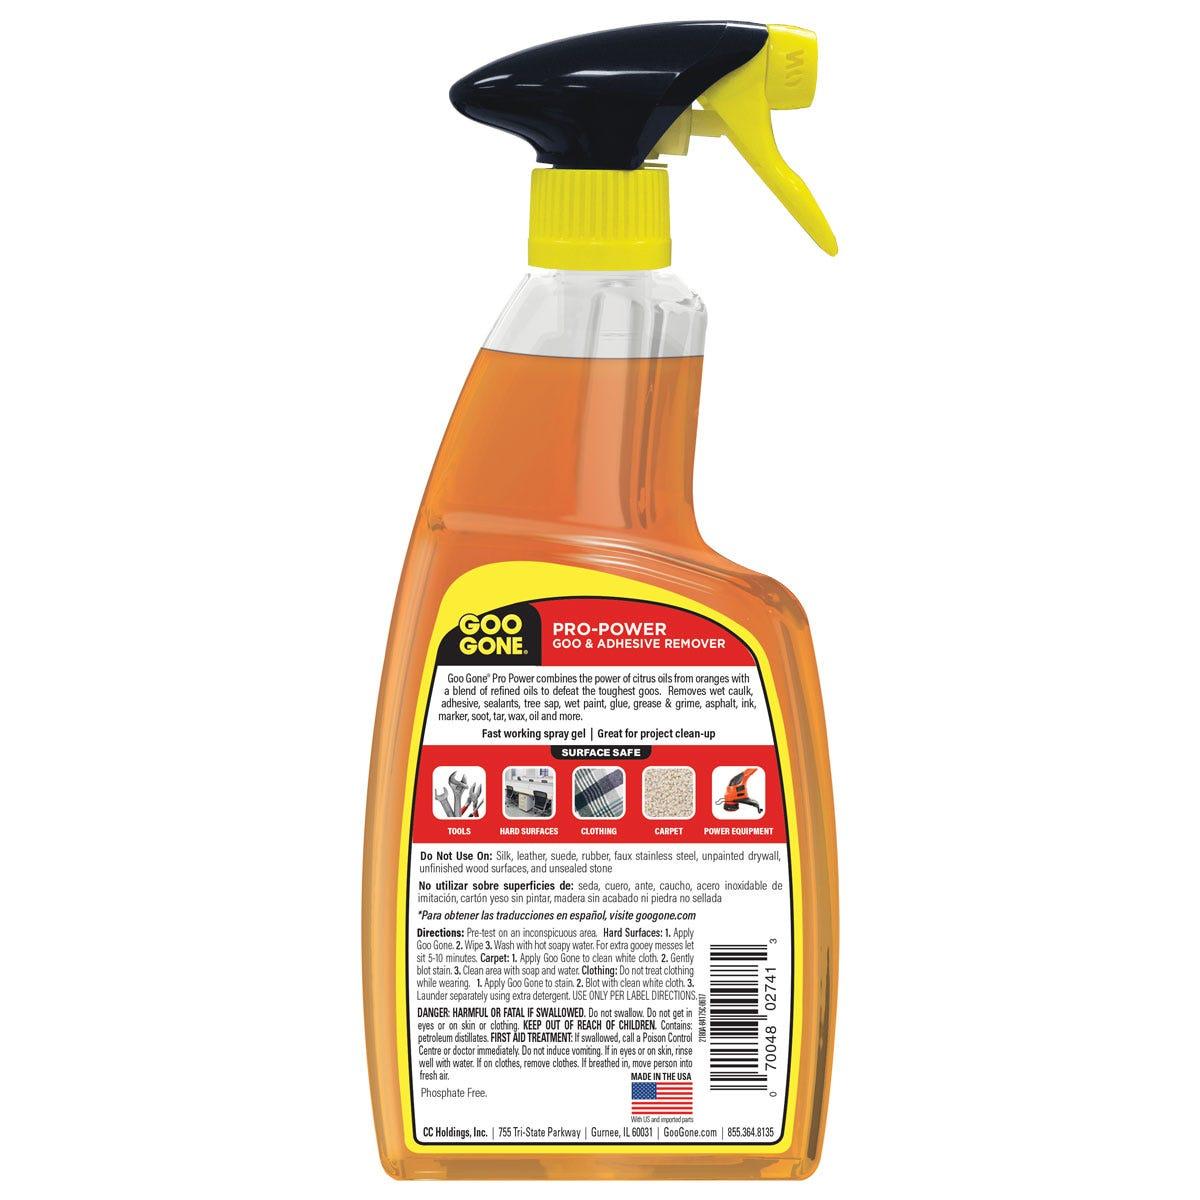 Pro-Power Goo & Adhesive Remover Spray Gel